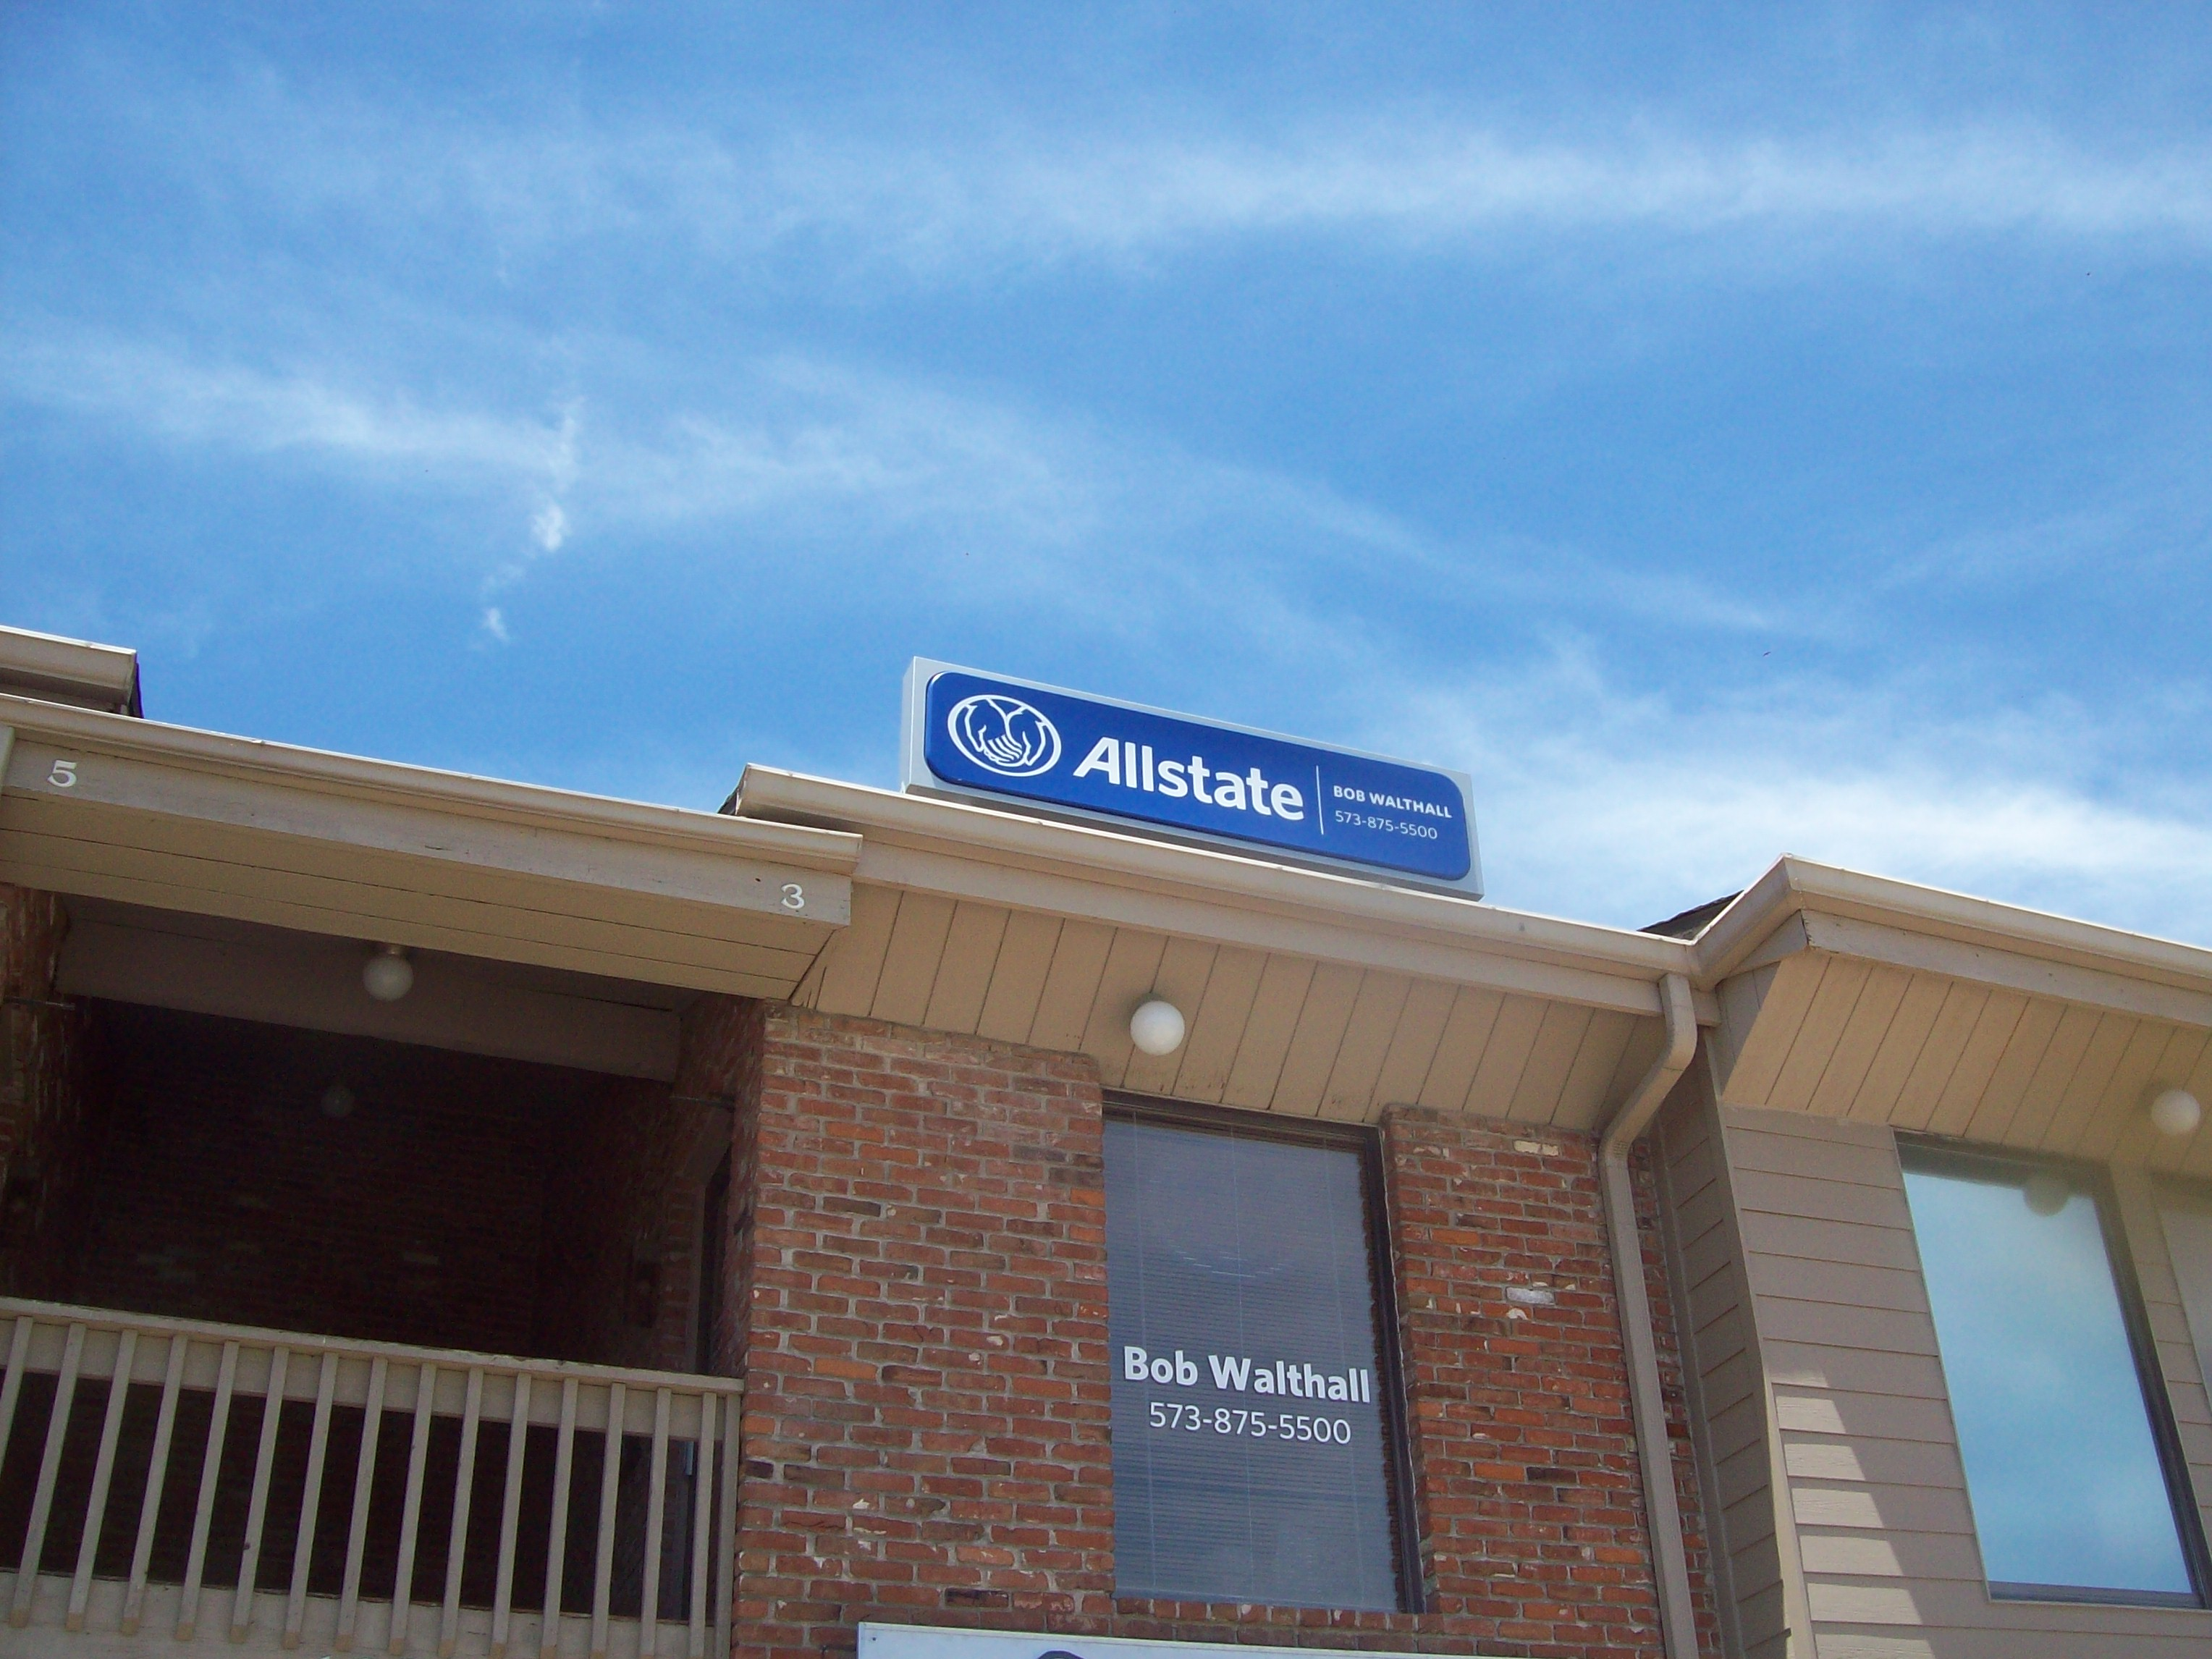 Bob Walthall: Allstate Insurance image 1